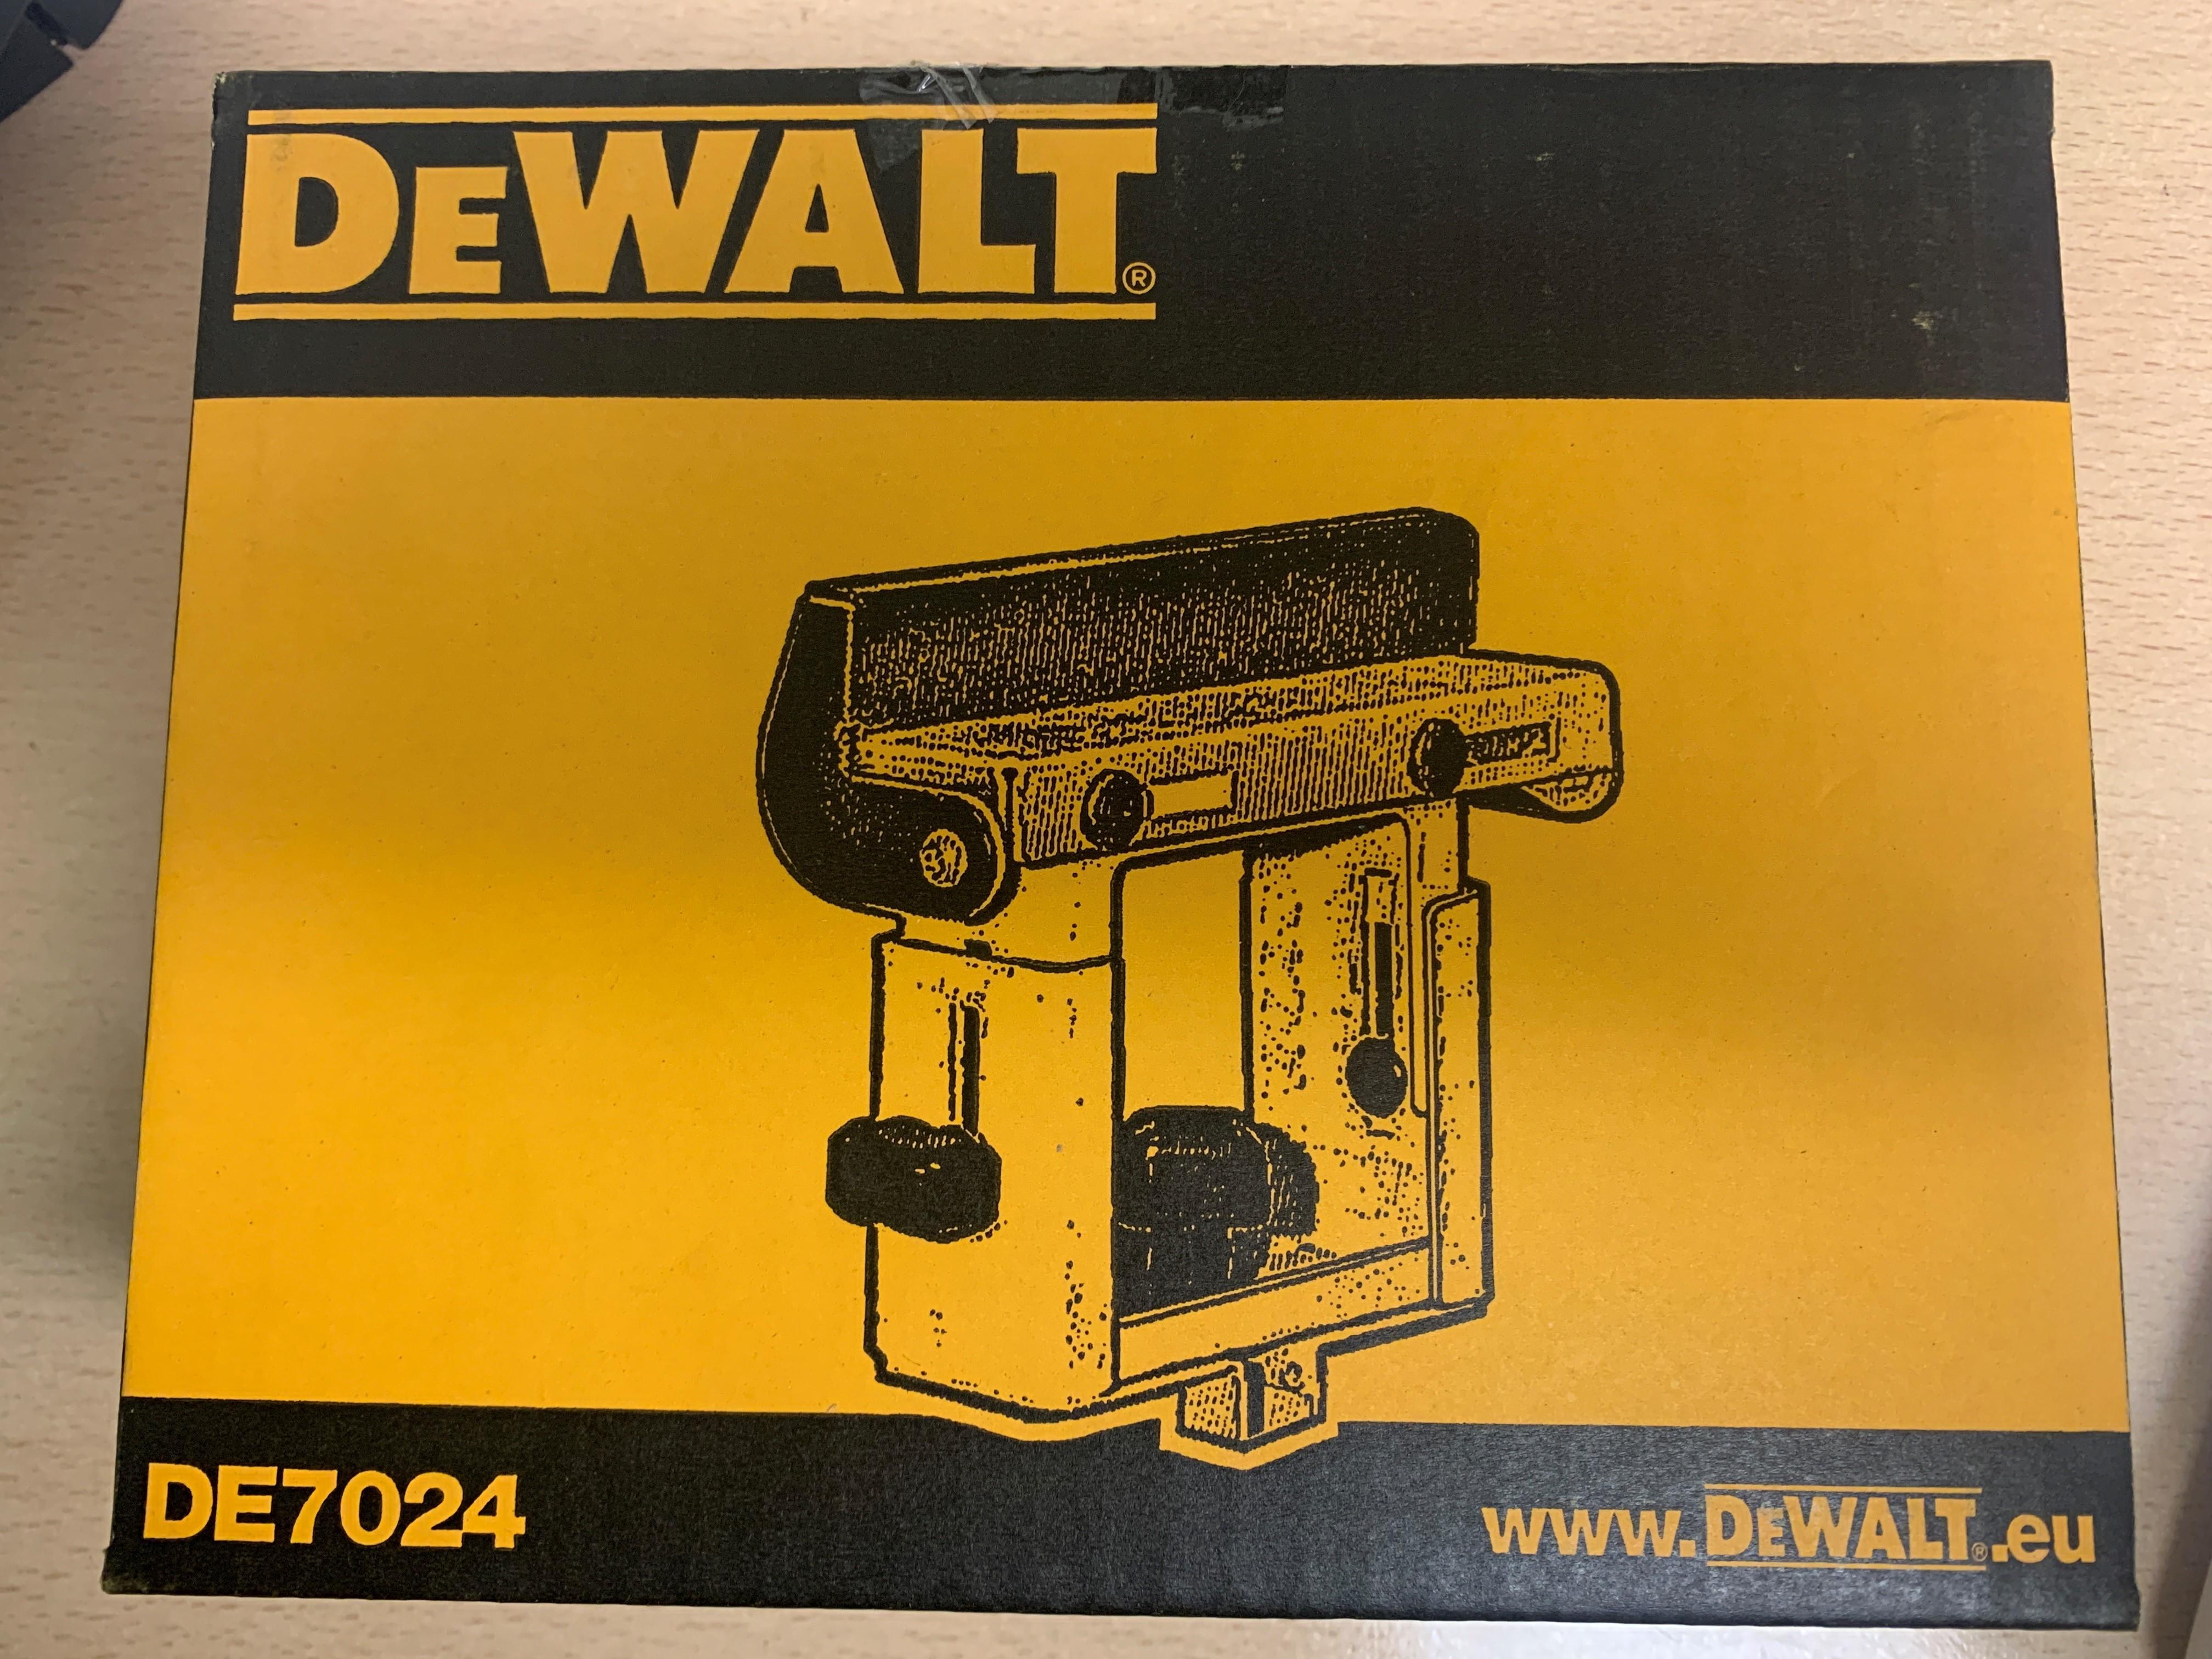 DeWalt DE7024 XJ Type 3 Mitre Saw Accessories Est. Original Retail £15,111, Nuneaton, GB